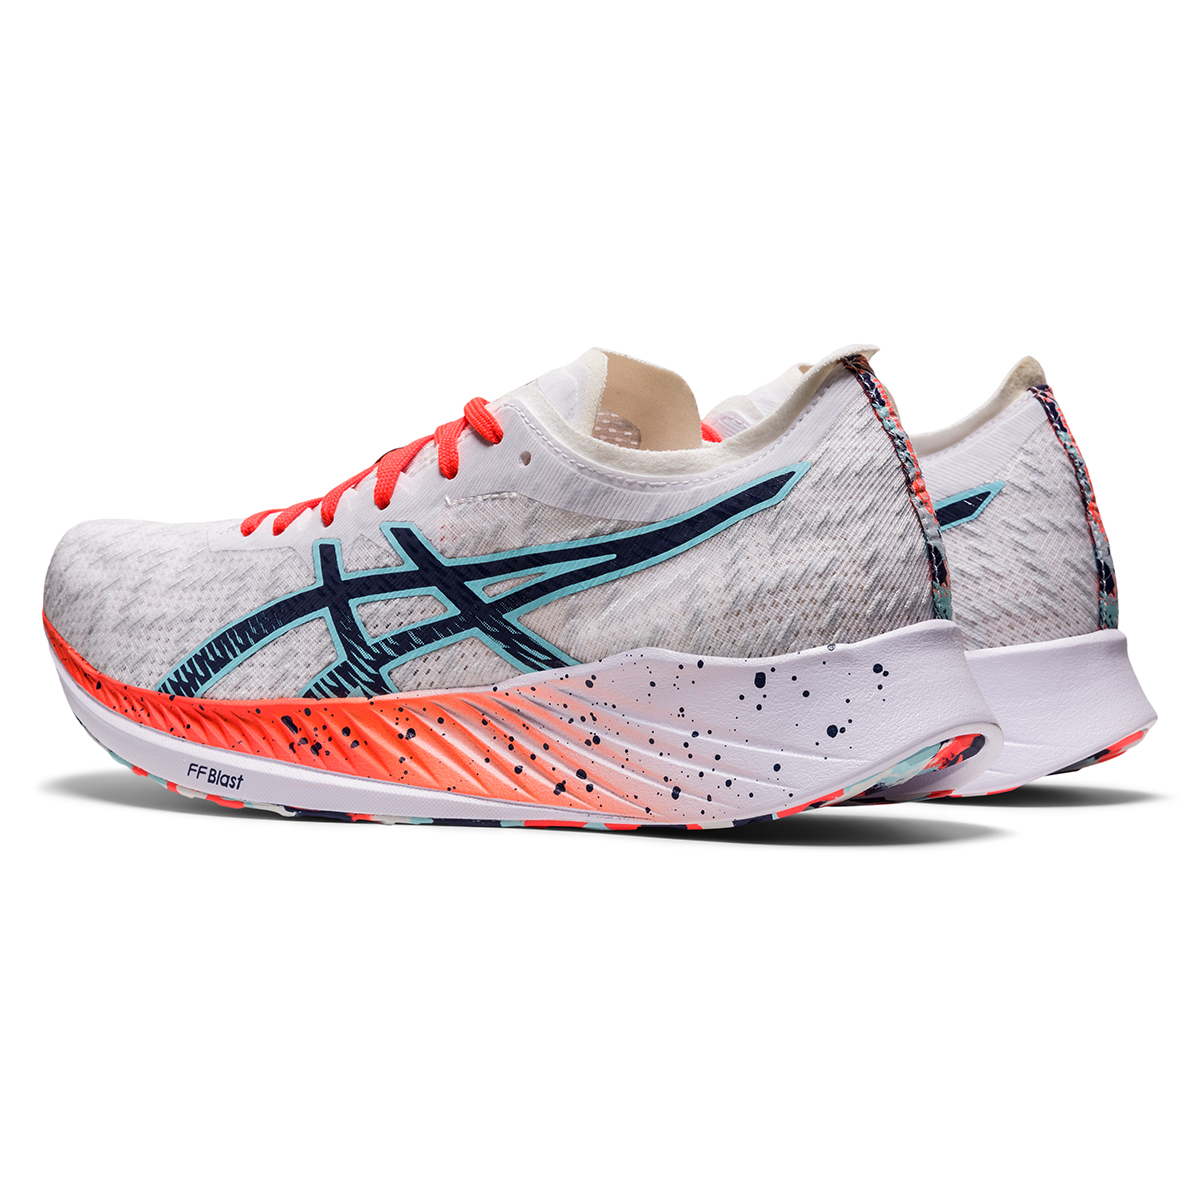 Women's Asics Magic Speed Running Shoe - Color: White/Thunder Blue - Size: 5 - Width: Regular, White/Thunder Blue, large, image 6